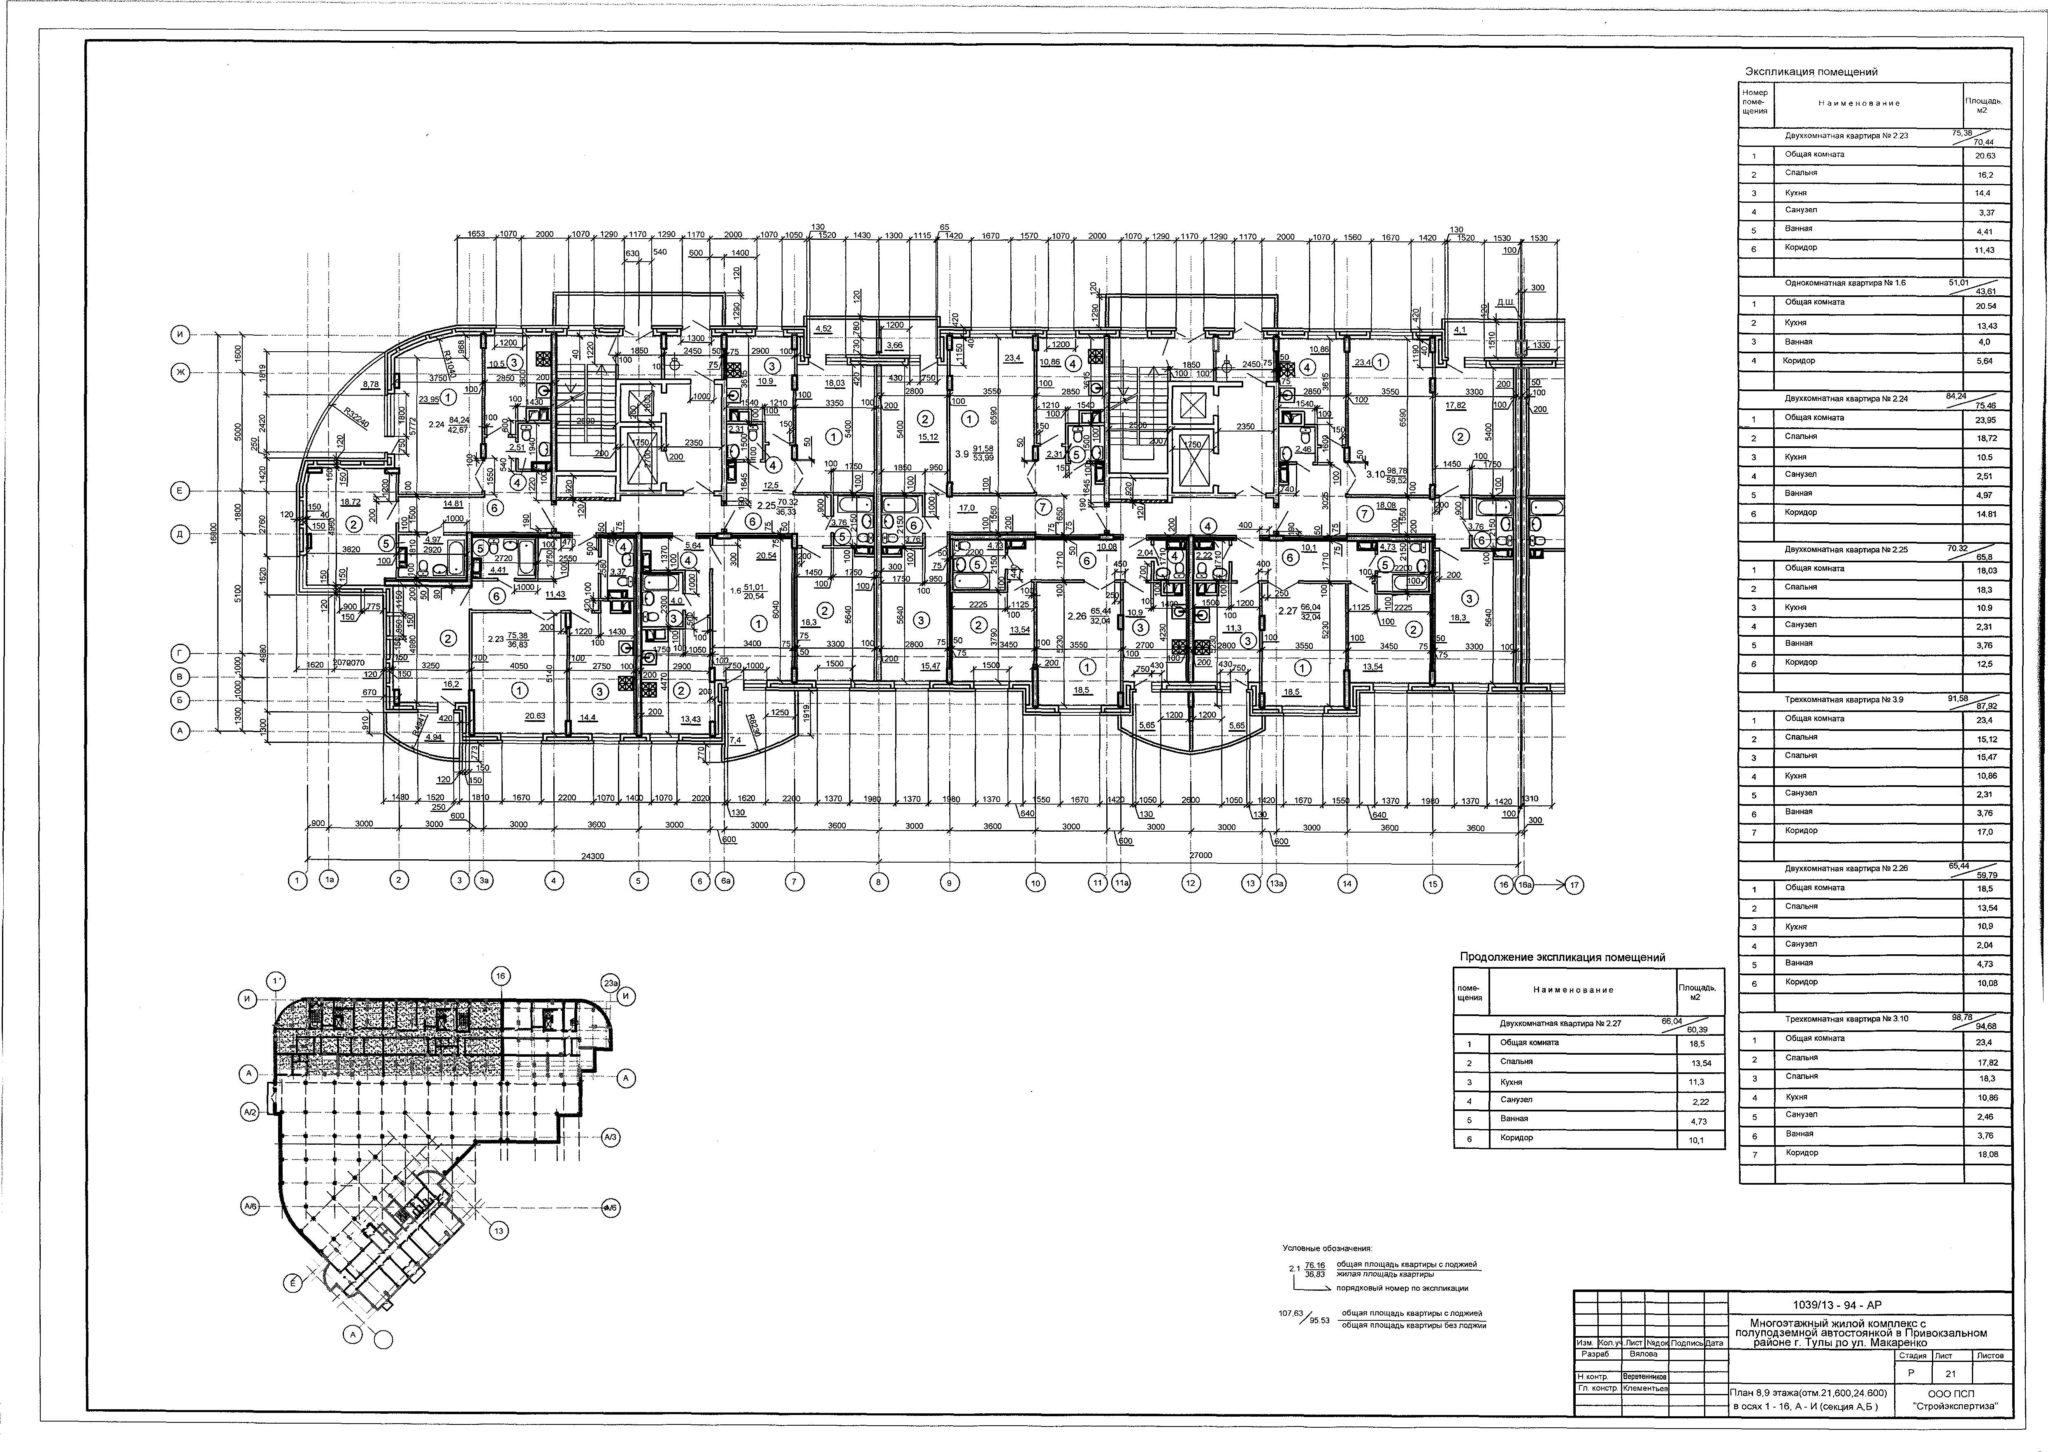 План 8,9 этажа секции А,Б ЖК МАКАРЕНКО